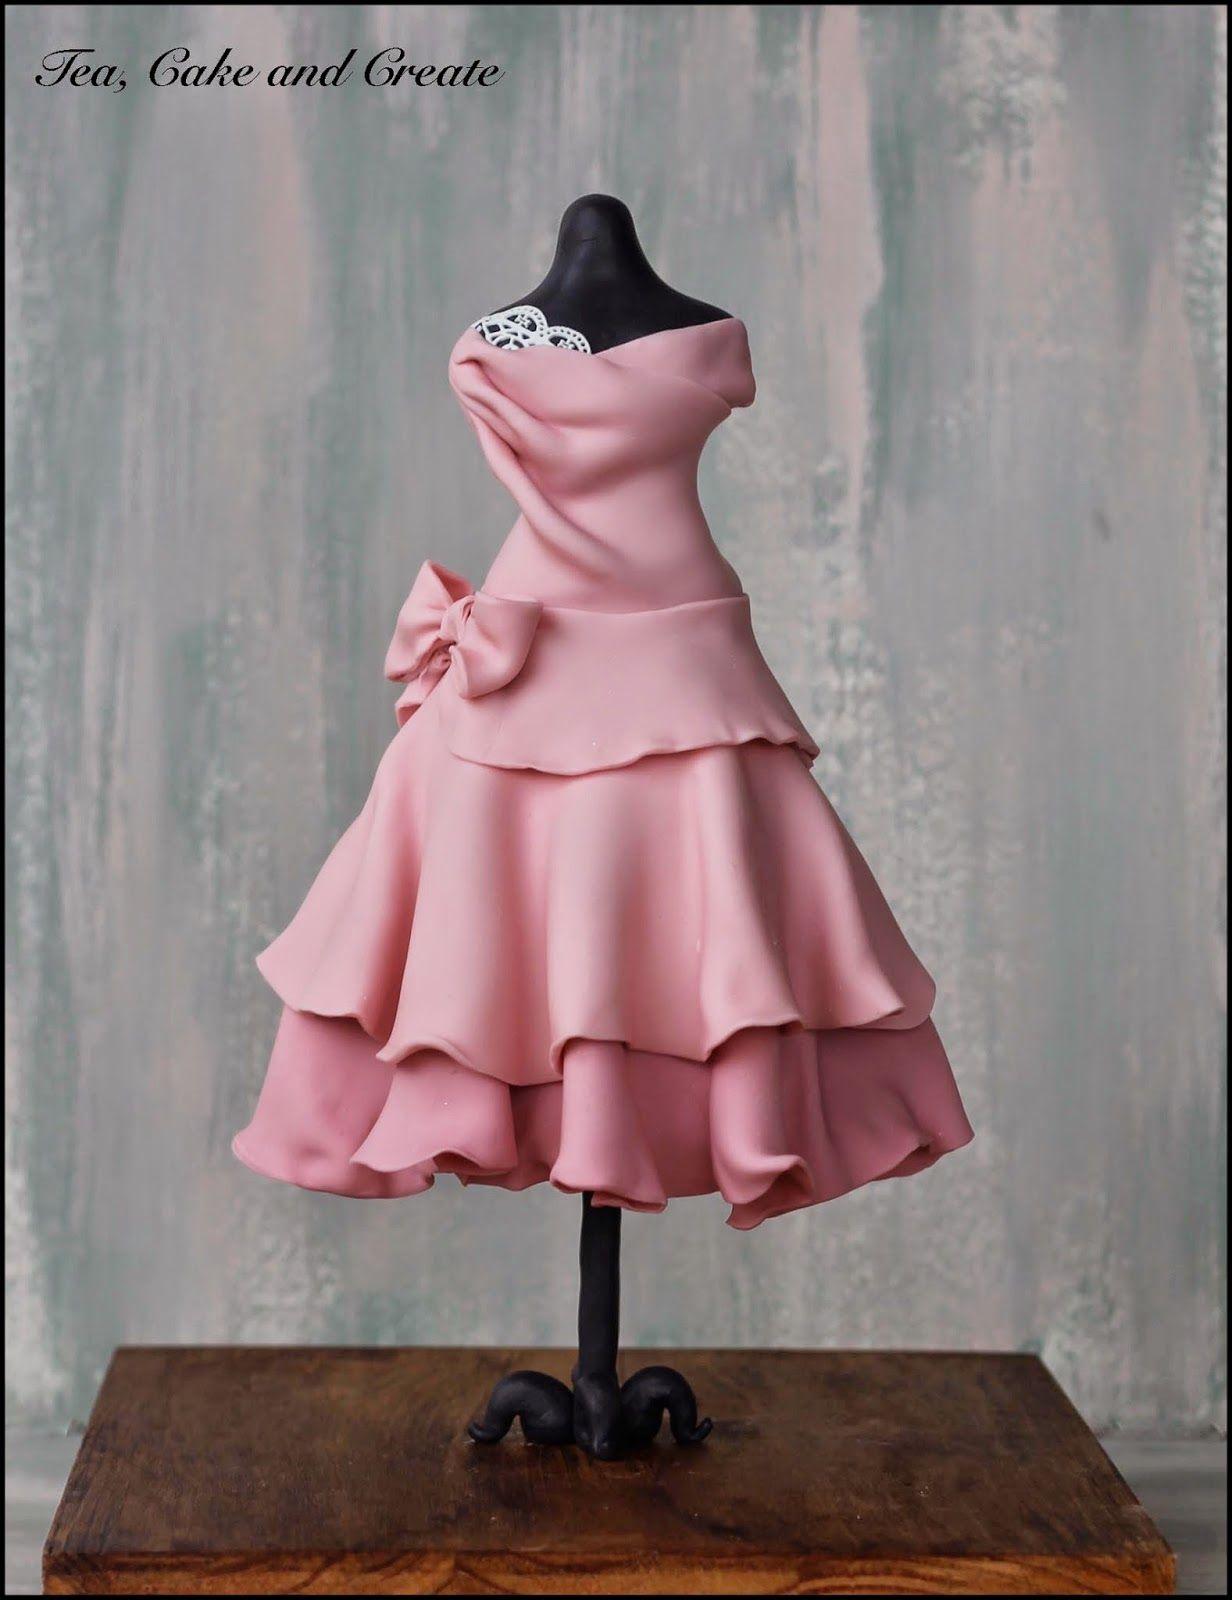 Dress-on-Mannequin Cake